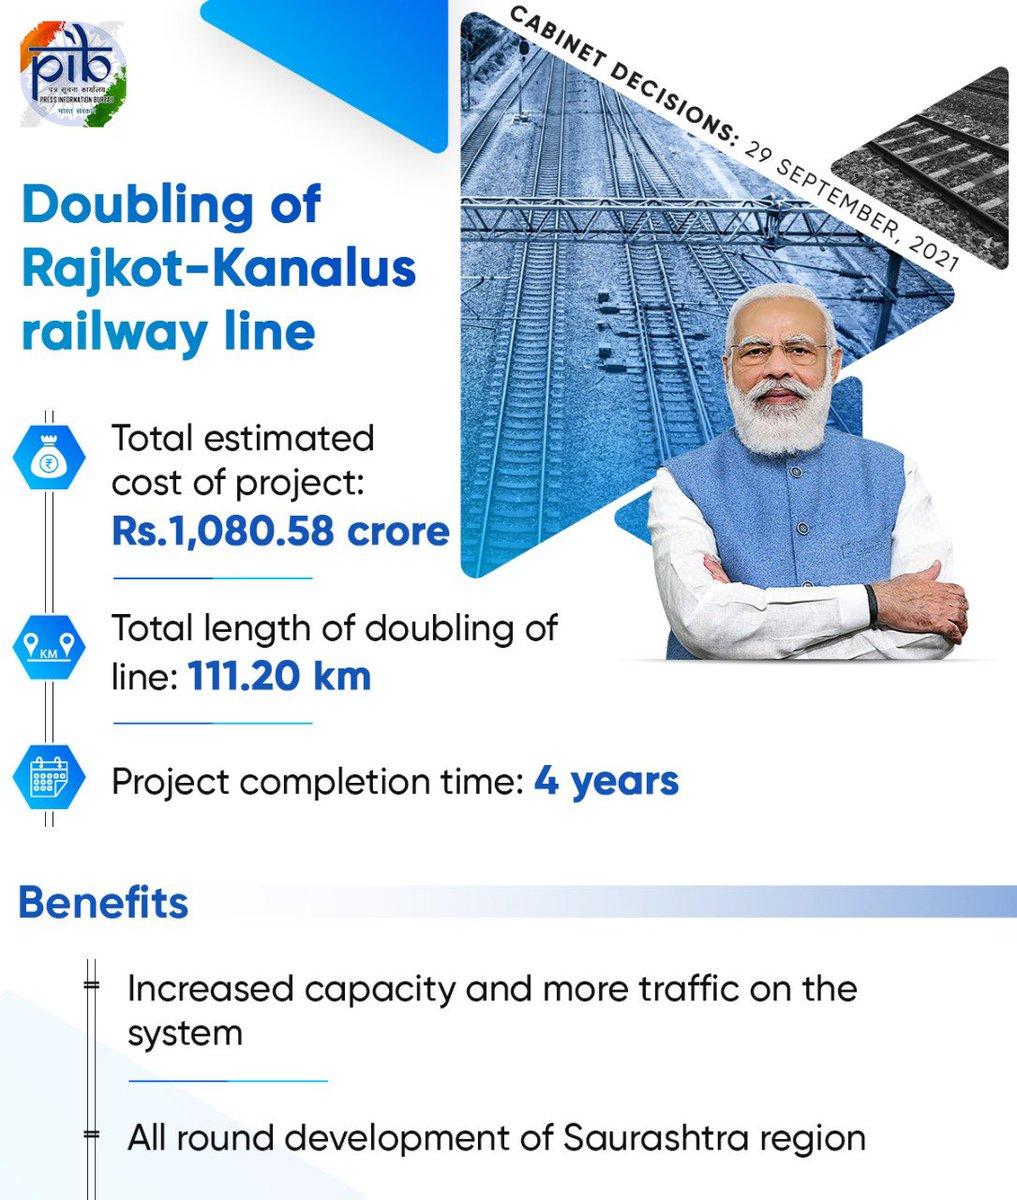 Union Cabinet approves doubling of Rajkot – Kanalus railway line in Gujarat